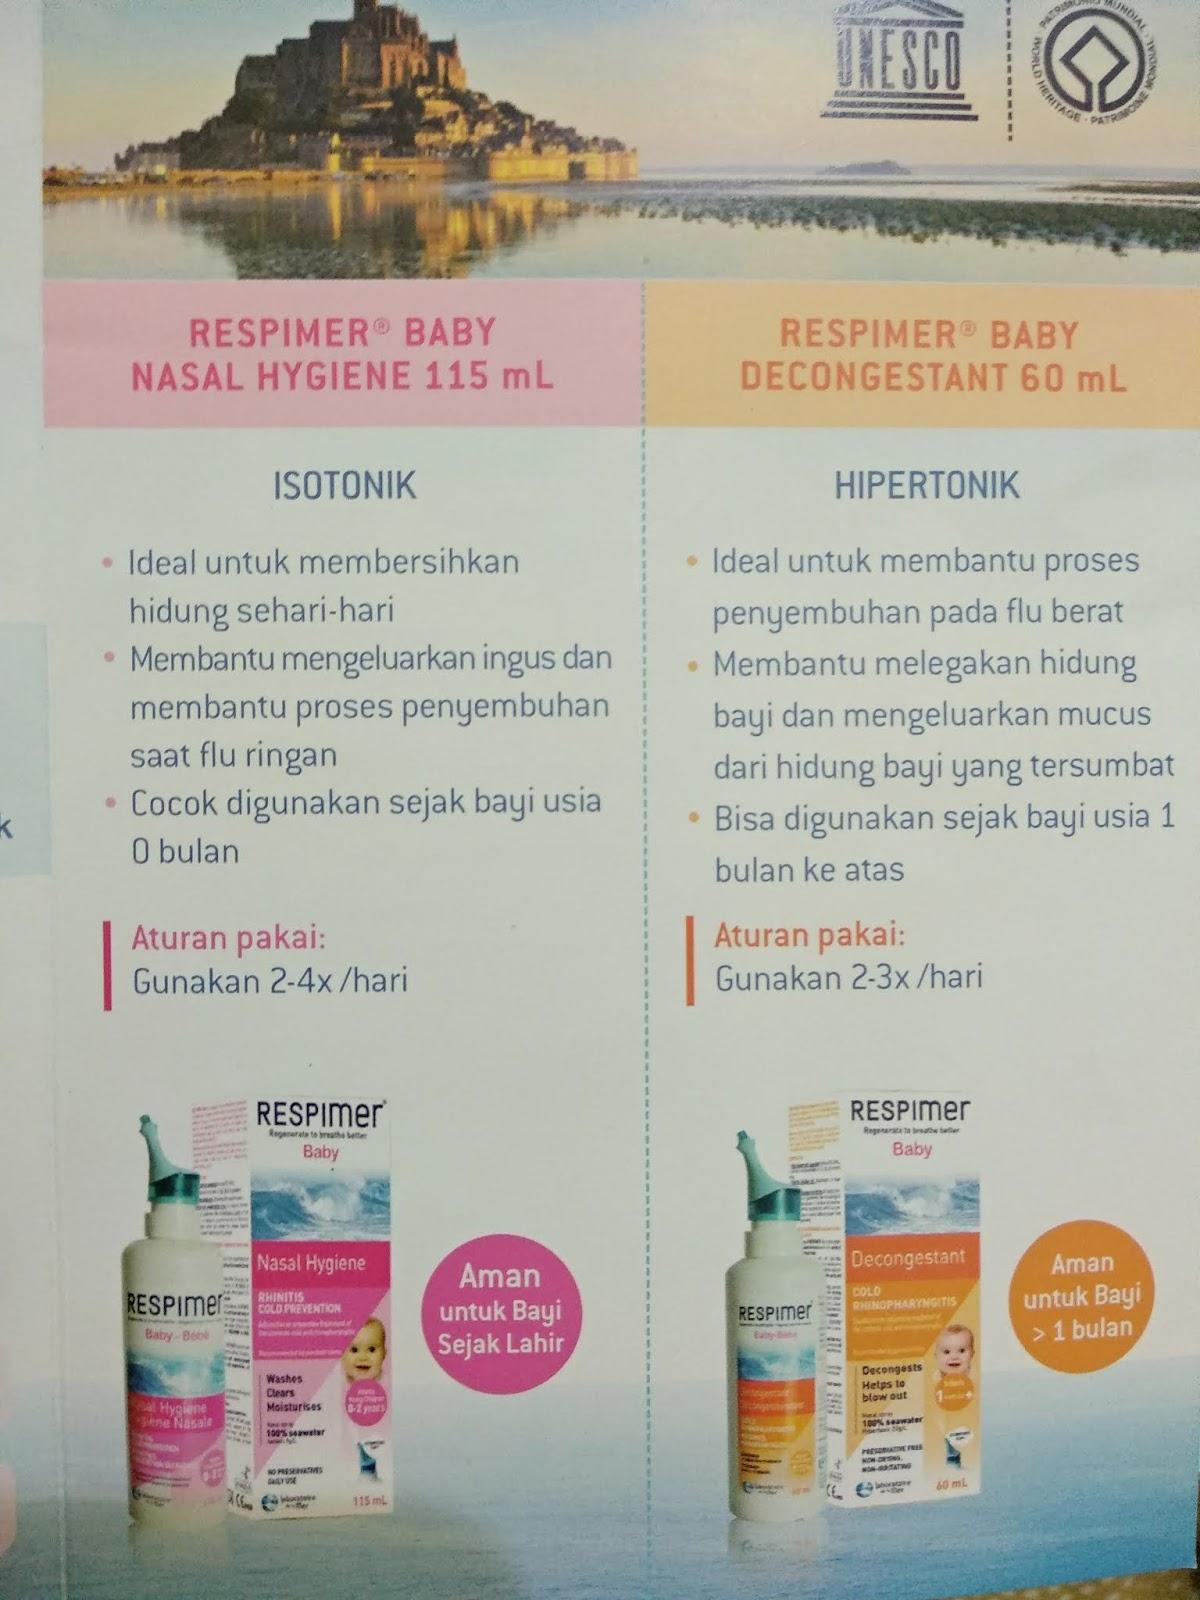 respimer baby nasal hygiene 11